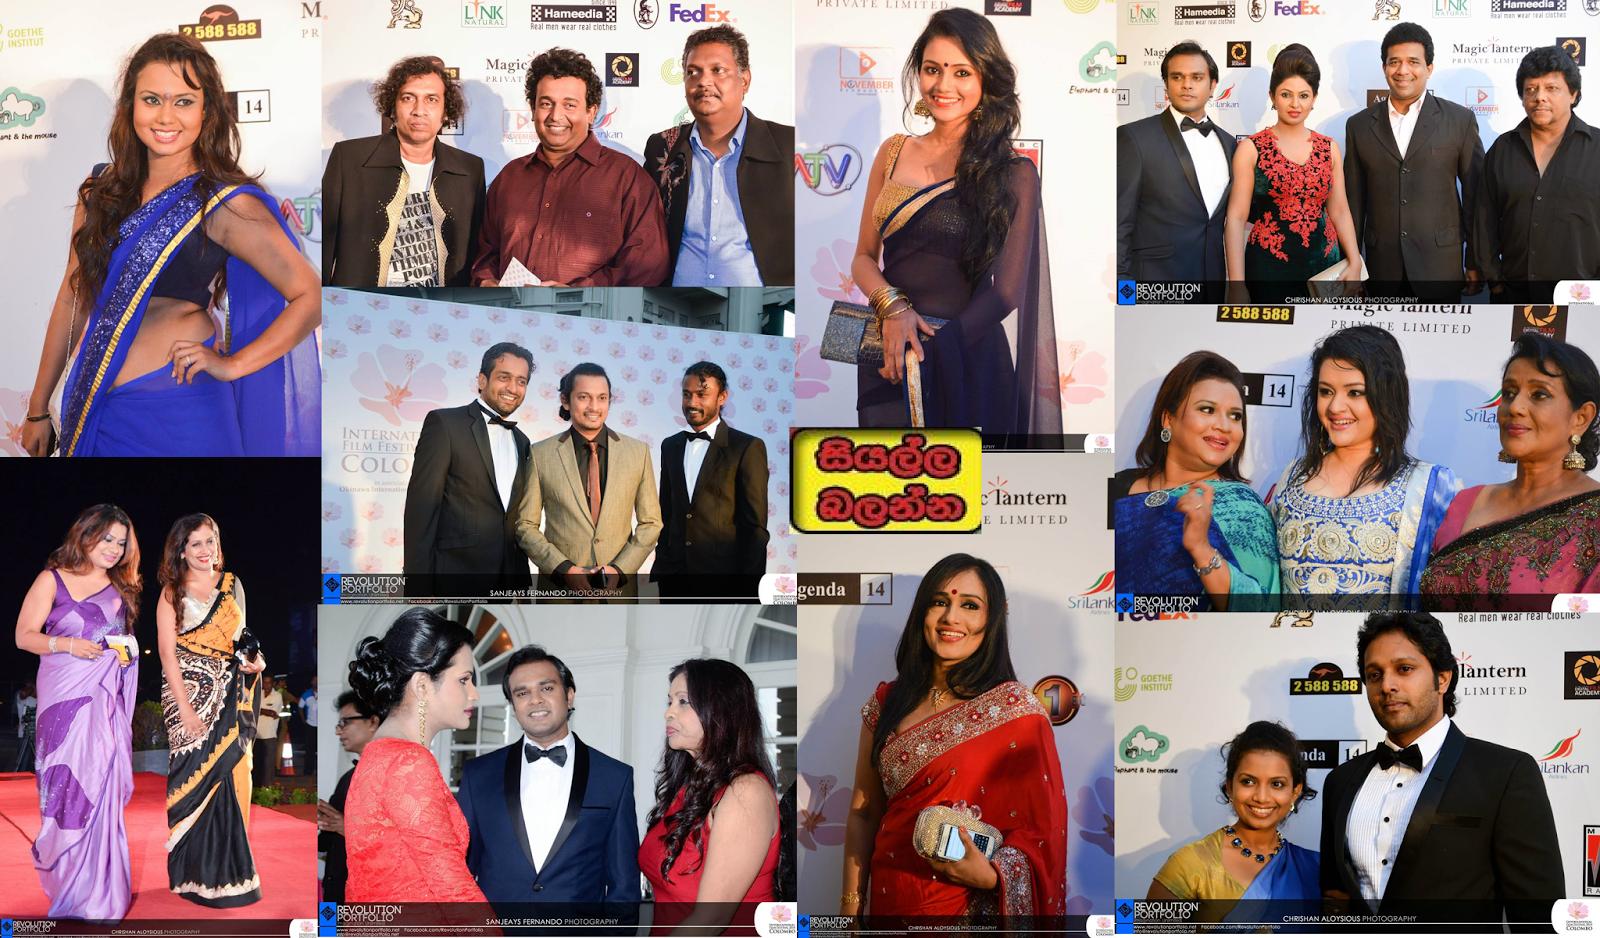 http://picture.gossiplankahotnews.com/2014/09/international-film-festival-2014.html